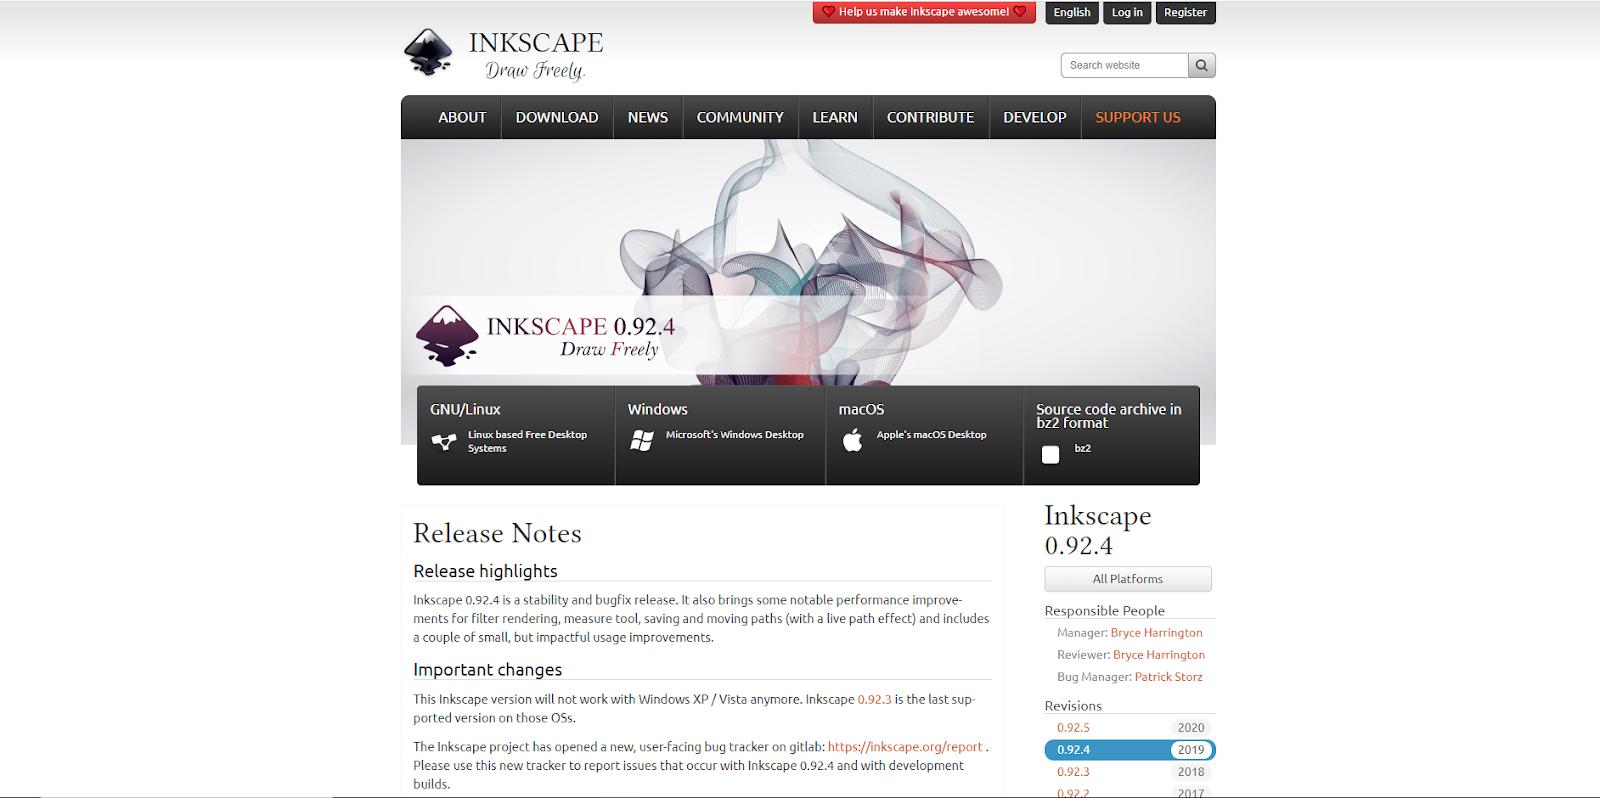 Inkscape - Free - Graphic Design Software